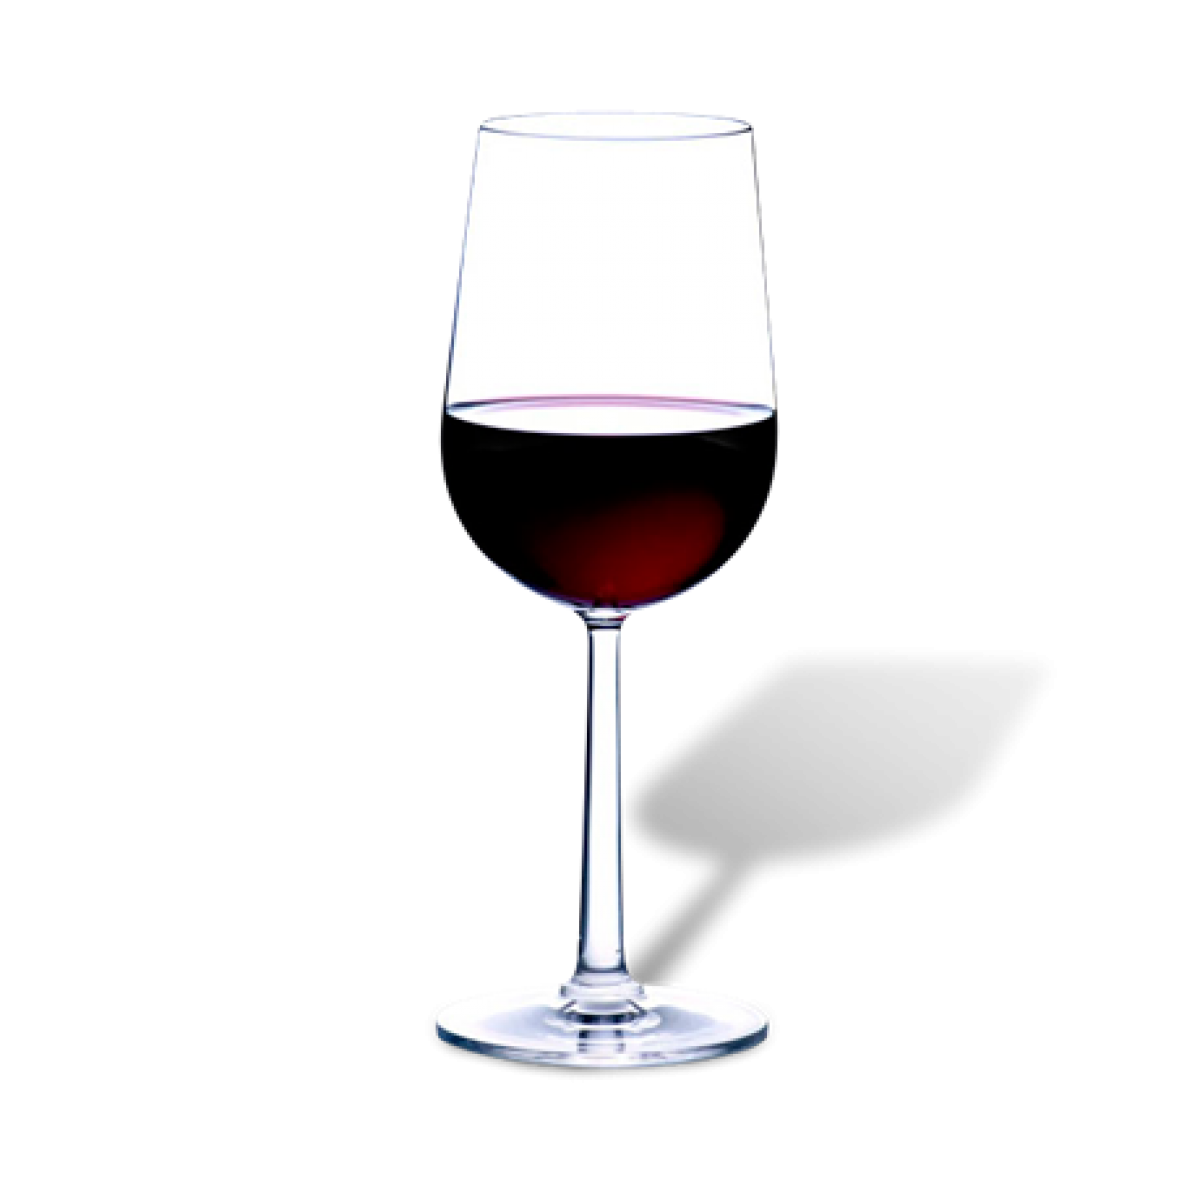 ROSENDAHL Grand Cru rødvinsglas bordeaux 45 cl 2 stk.